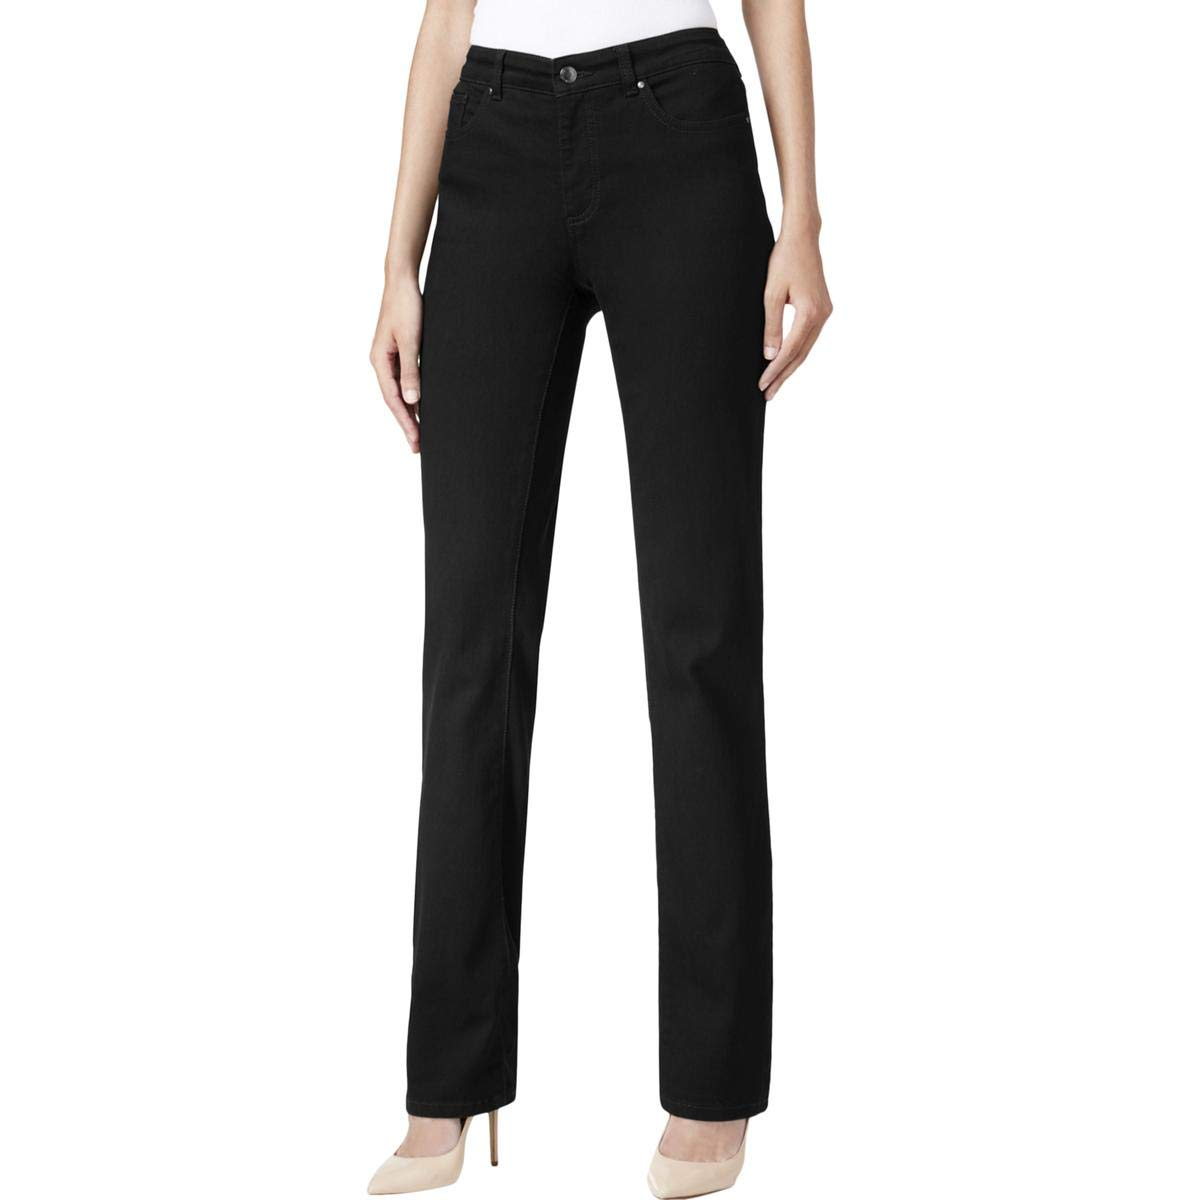 Charter Club Womens Petites Jean Shop Straight Leg Straight Leg Jeans Black 10P